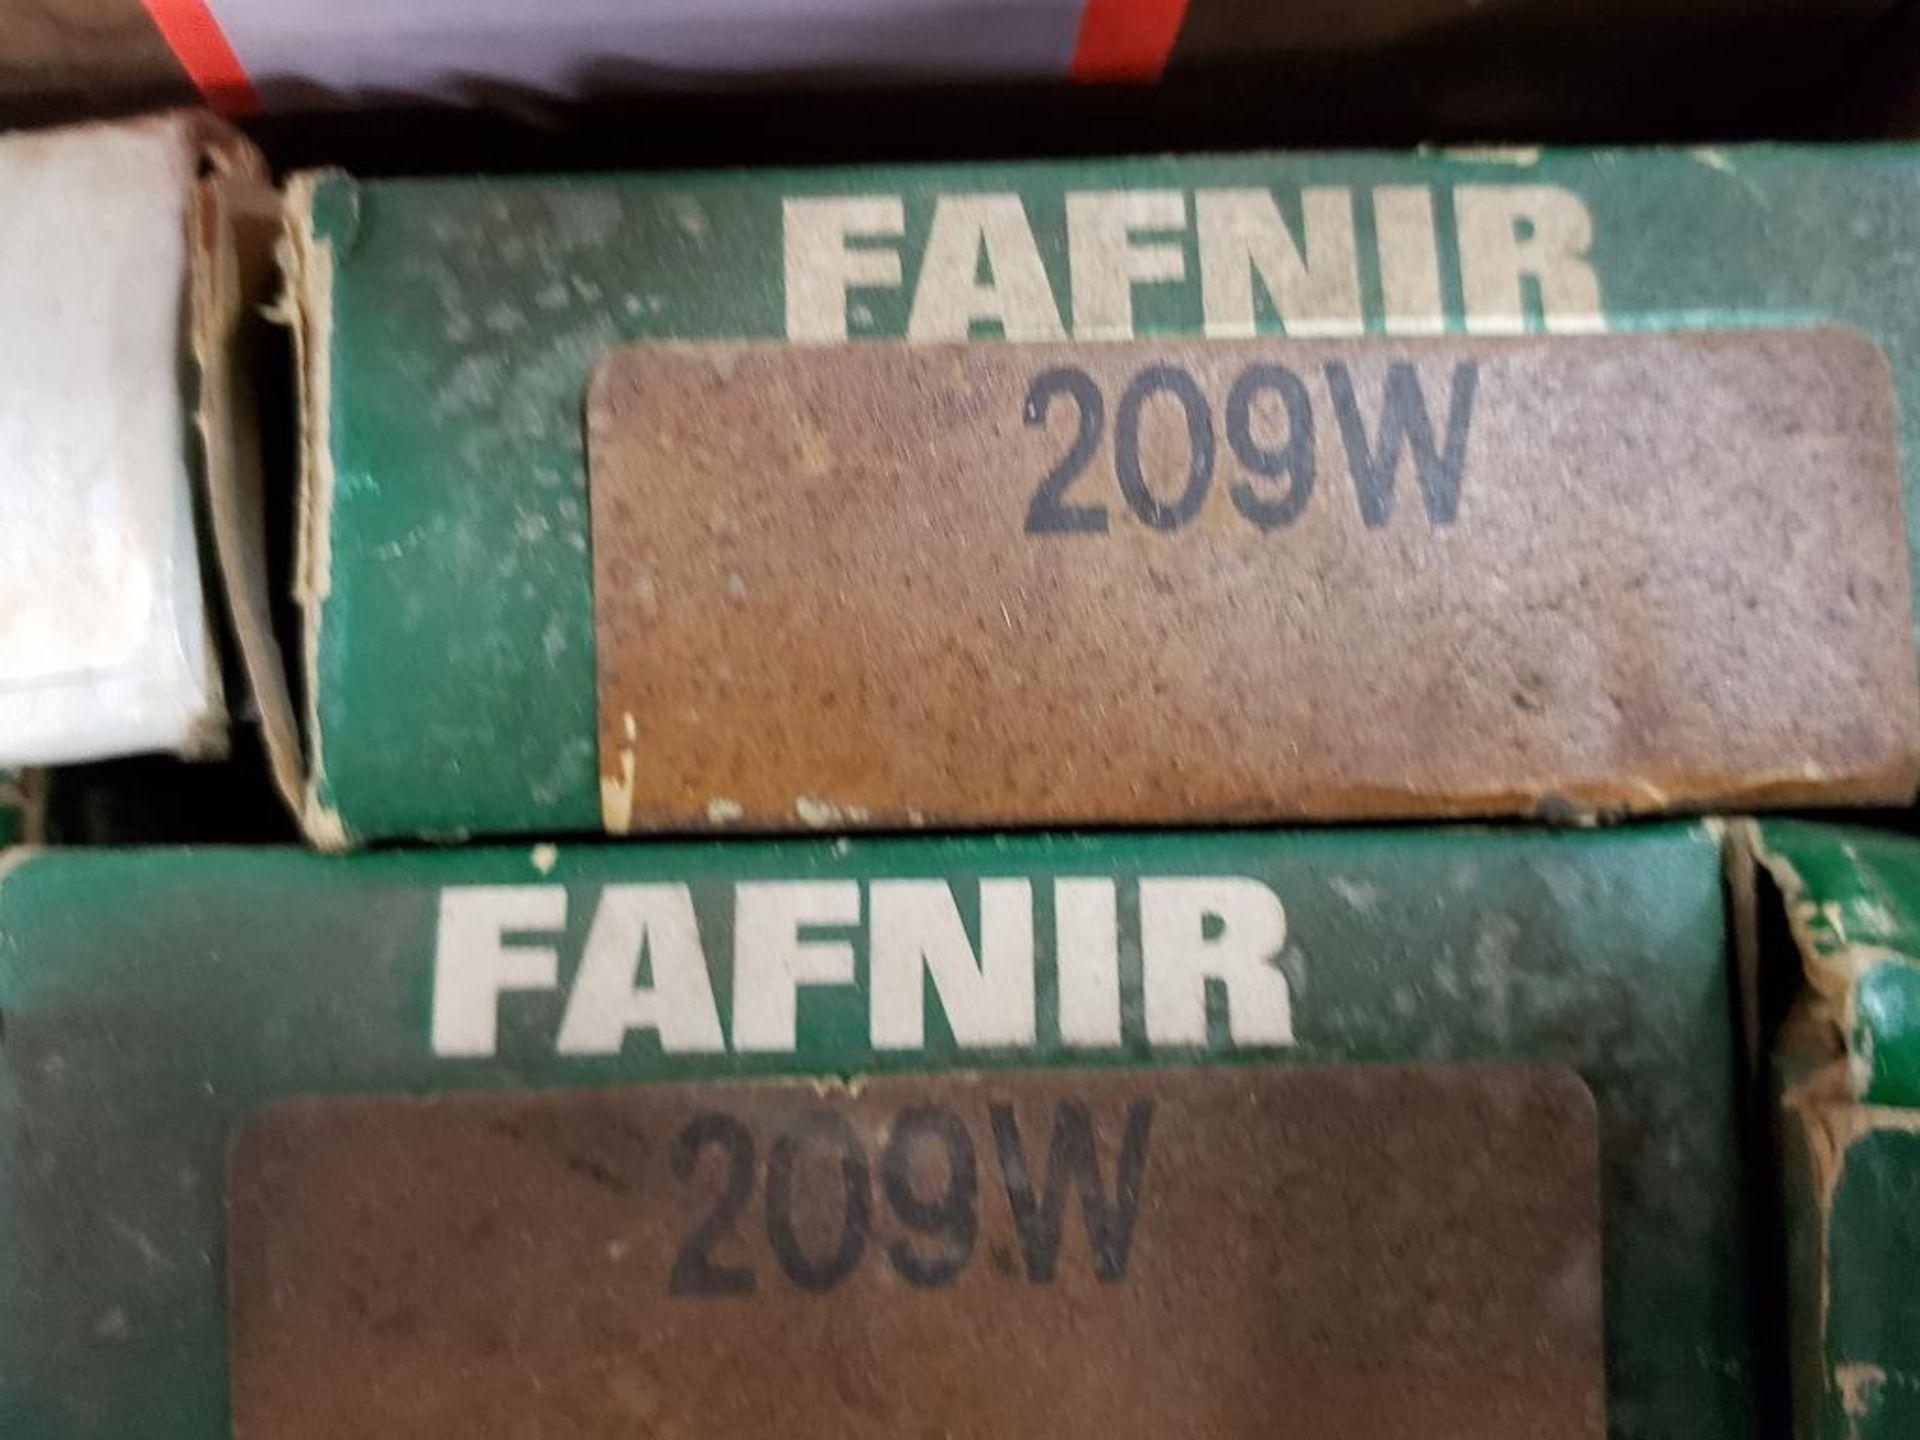 Assorted bearings. INA, Fafnir. - Image 4 of 14